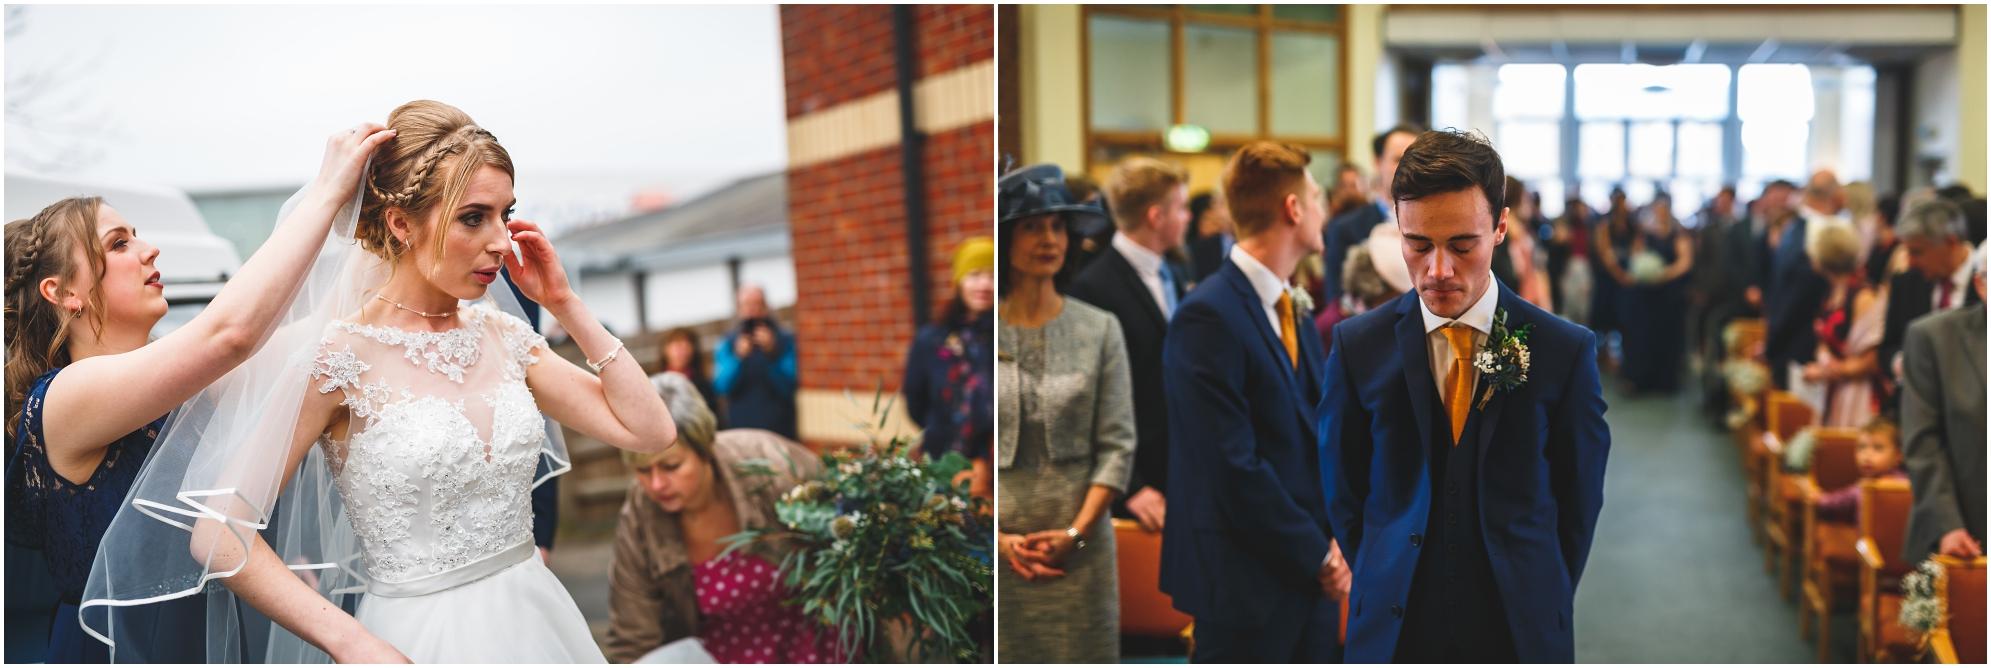 Luke calpis wedding